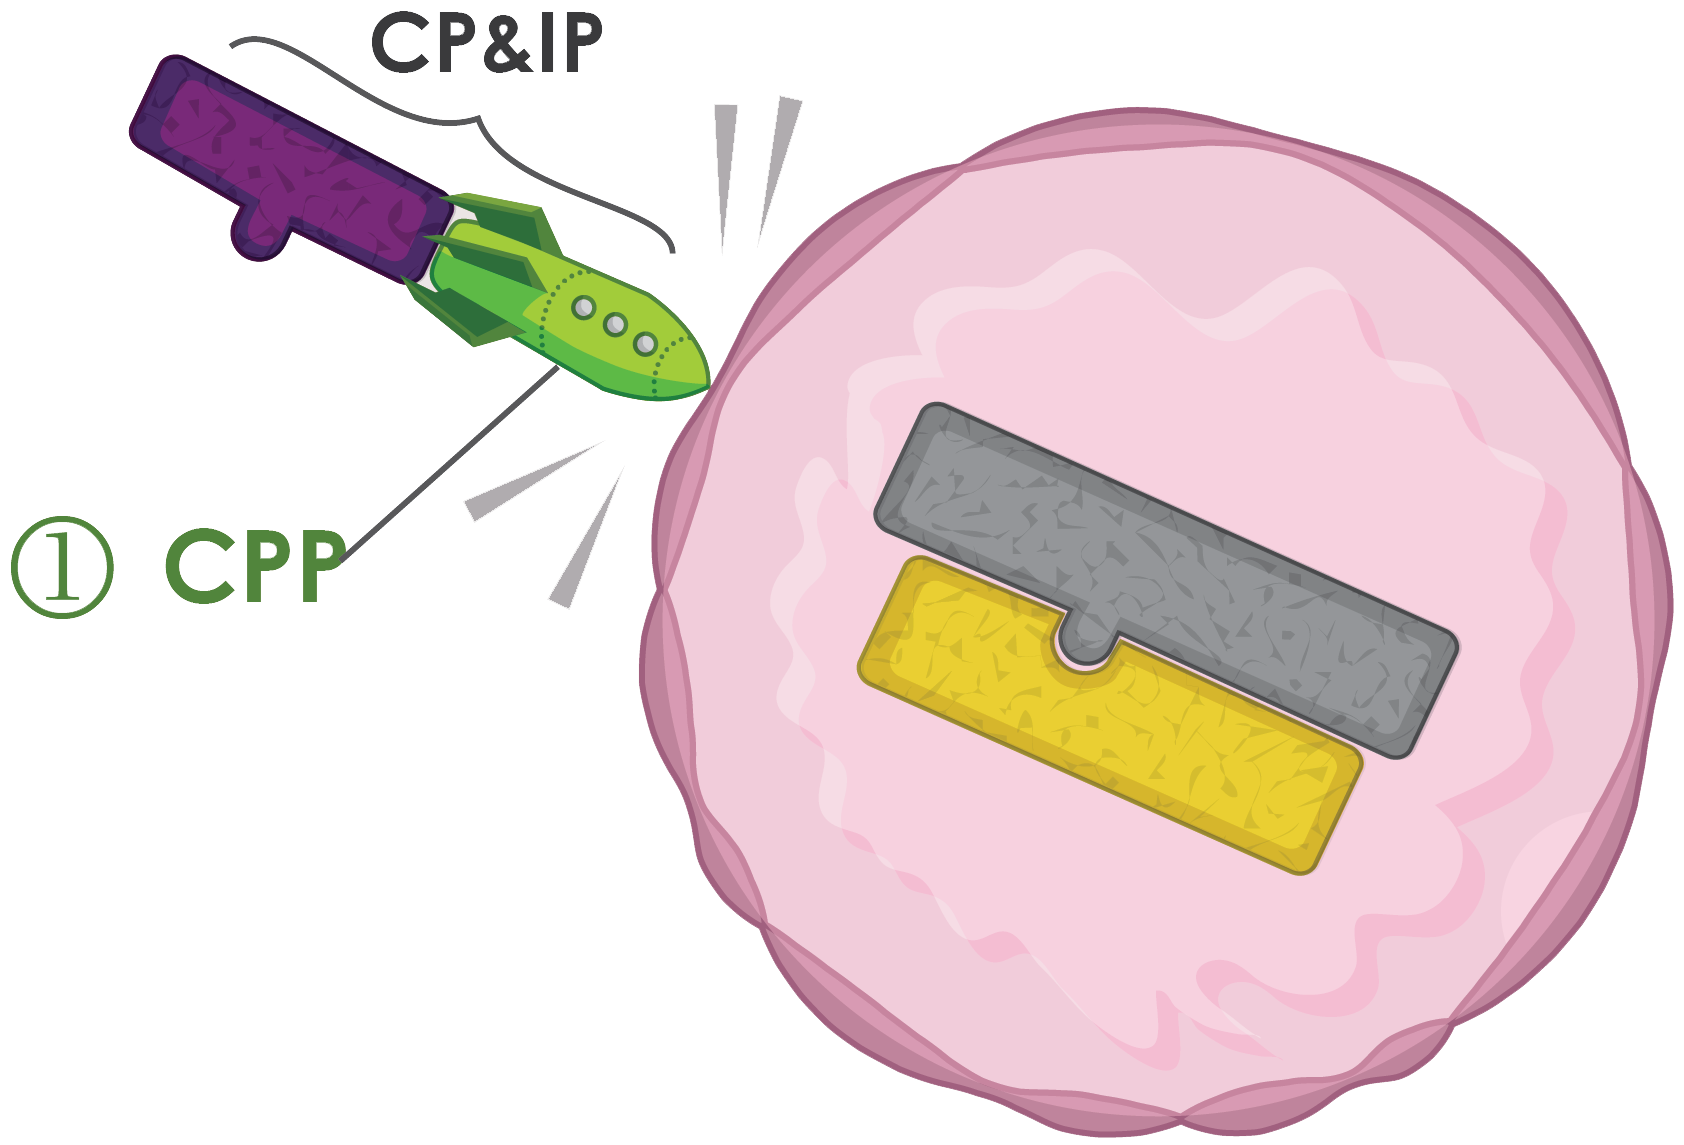 Cp&IP image